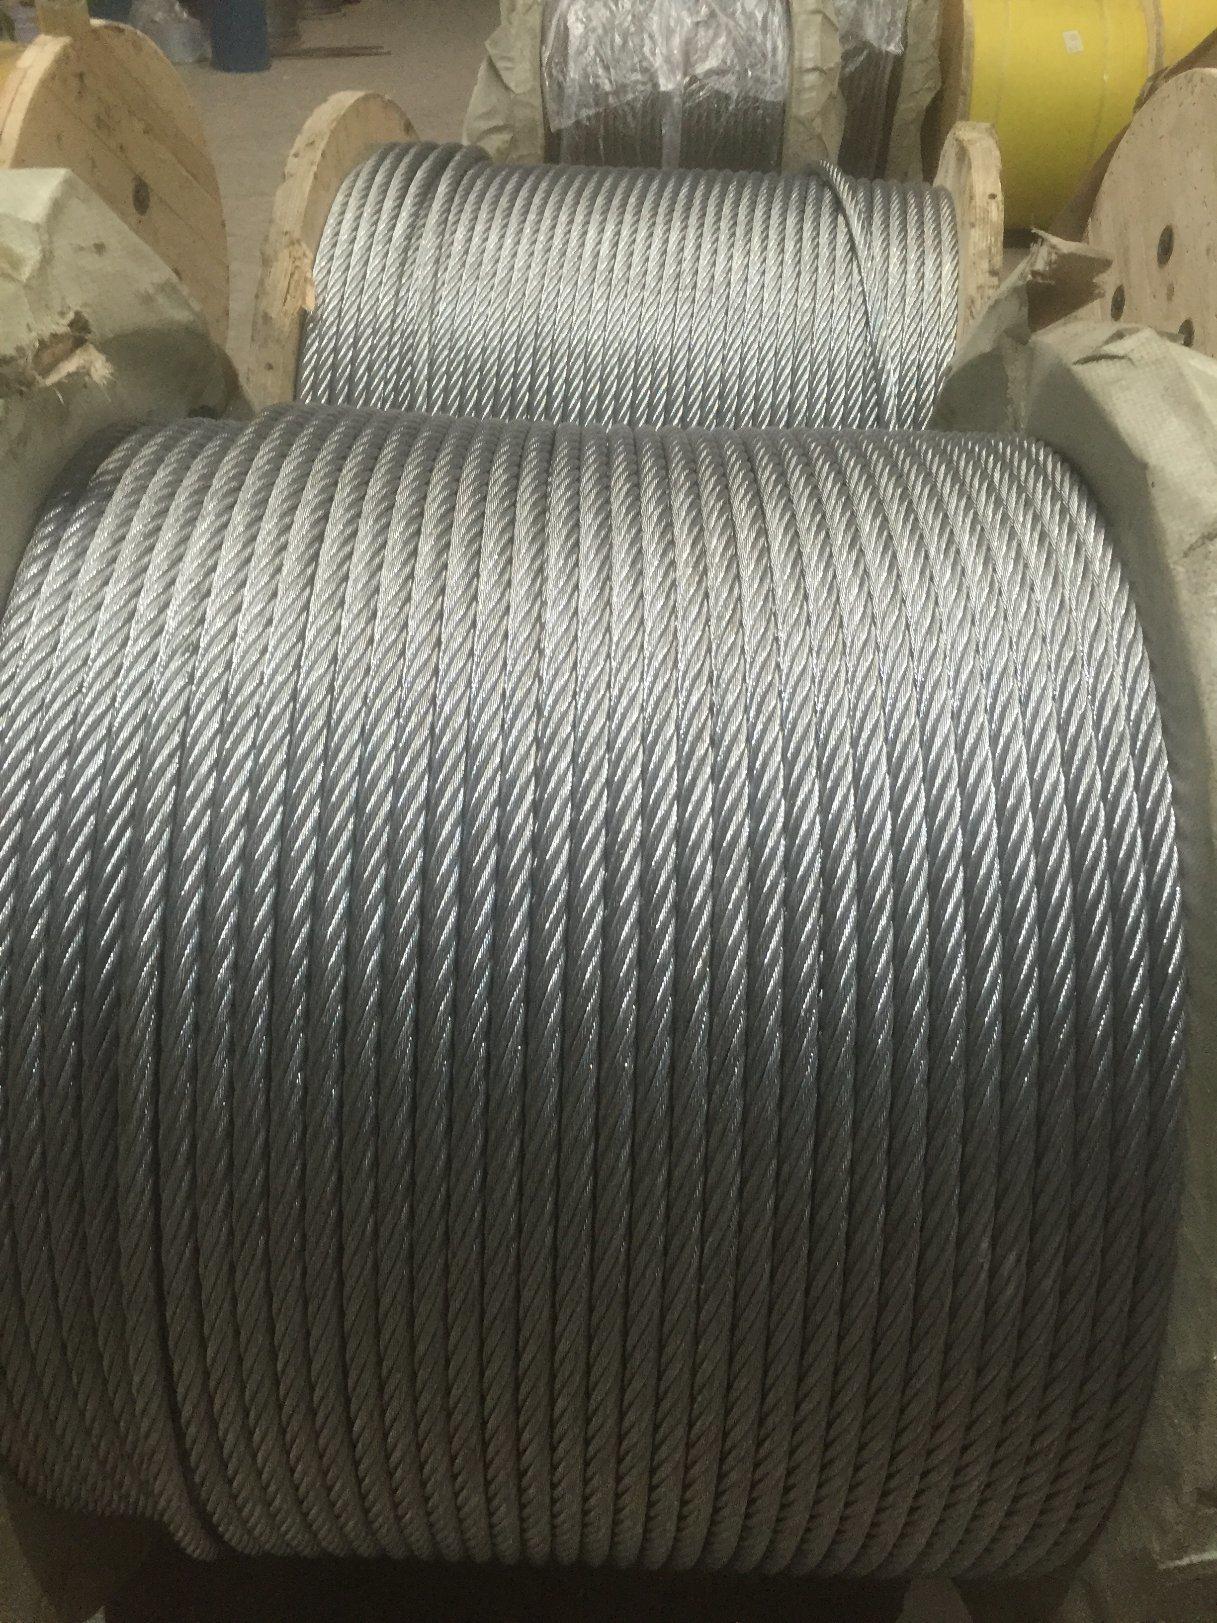 Unique 6x19 Wire Rope Gift - Wiring Diagram Ideas - guapodugh.com